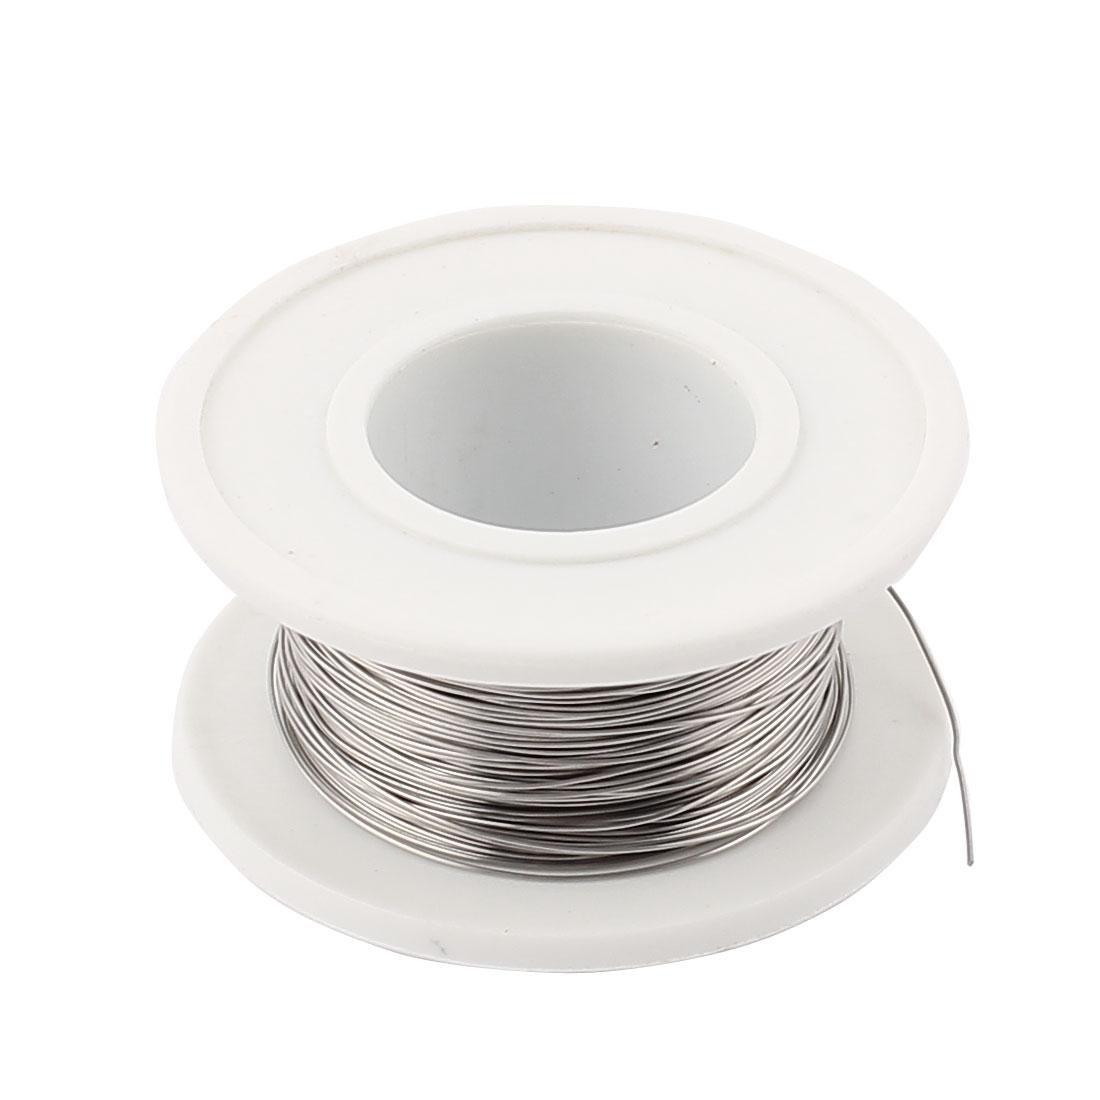 Nichrome 80 Round 0.3mm 29Gauge AWG 131.23ft Roll 15.42Ohm/m Heater Wire